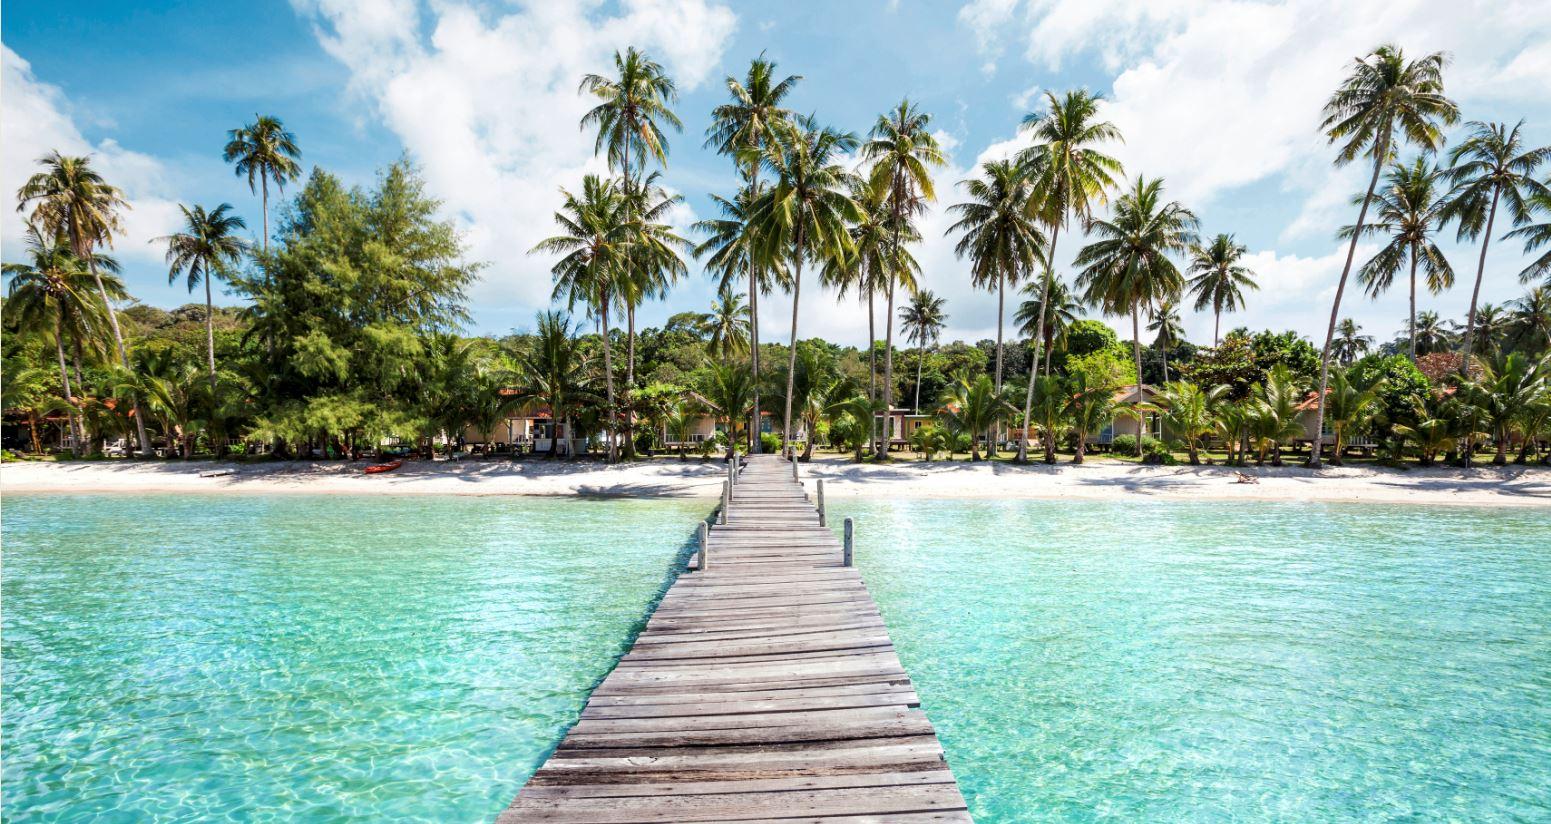 Ferien, Luxushotels, Luxusferien, Luxusreisen auf den Seychellen, Mauritius, Thailand, Malediven, Oman, Bali, Südafrika, Sri Lanka oder Dubai buchen